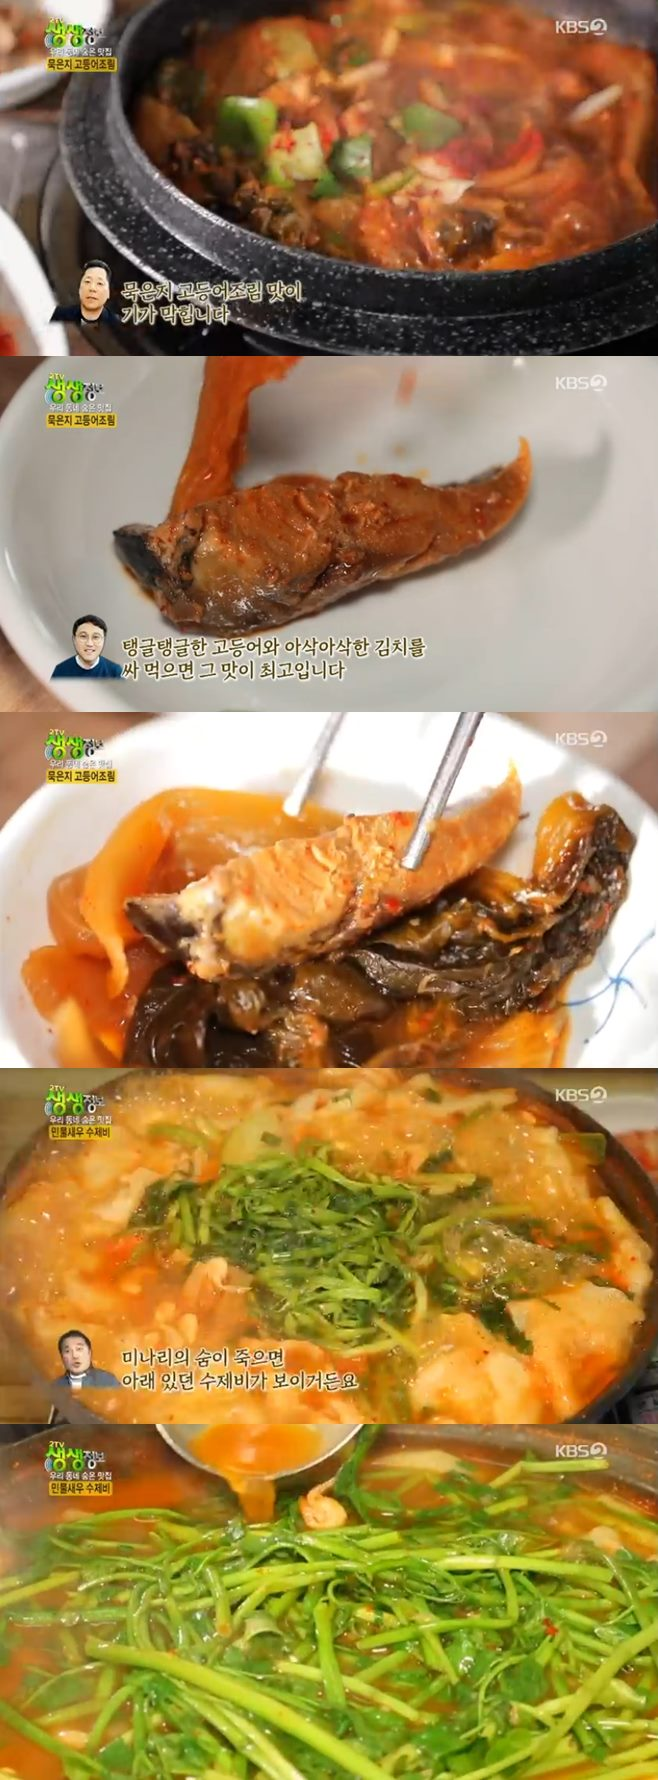 '2TV 생생정보' 꼬막비빔밥·무침vs묵은지고등어조림vs민물새우얼큰손수제비 맛집